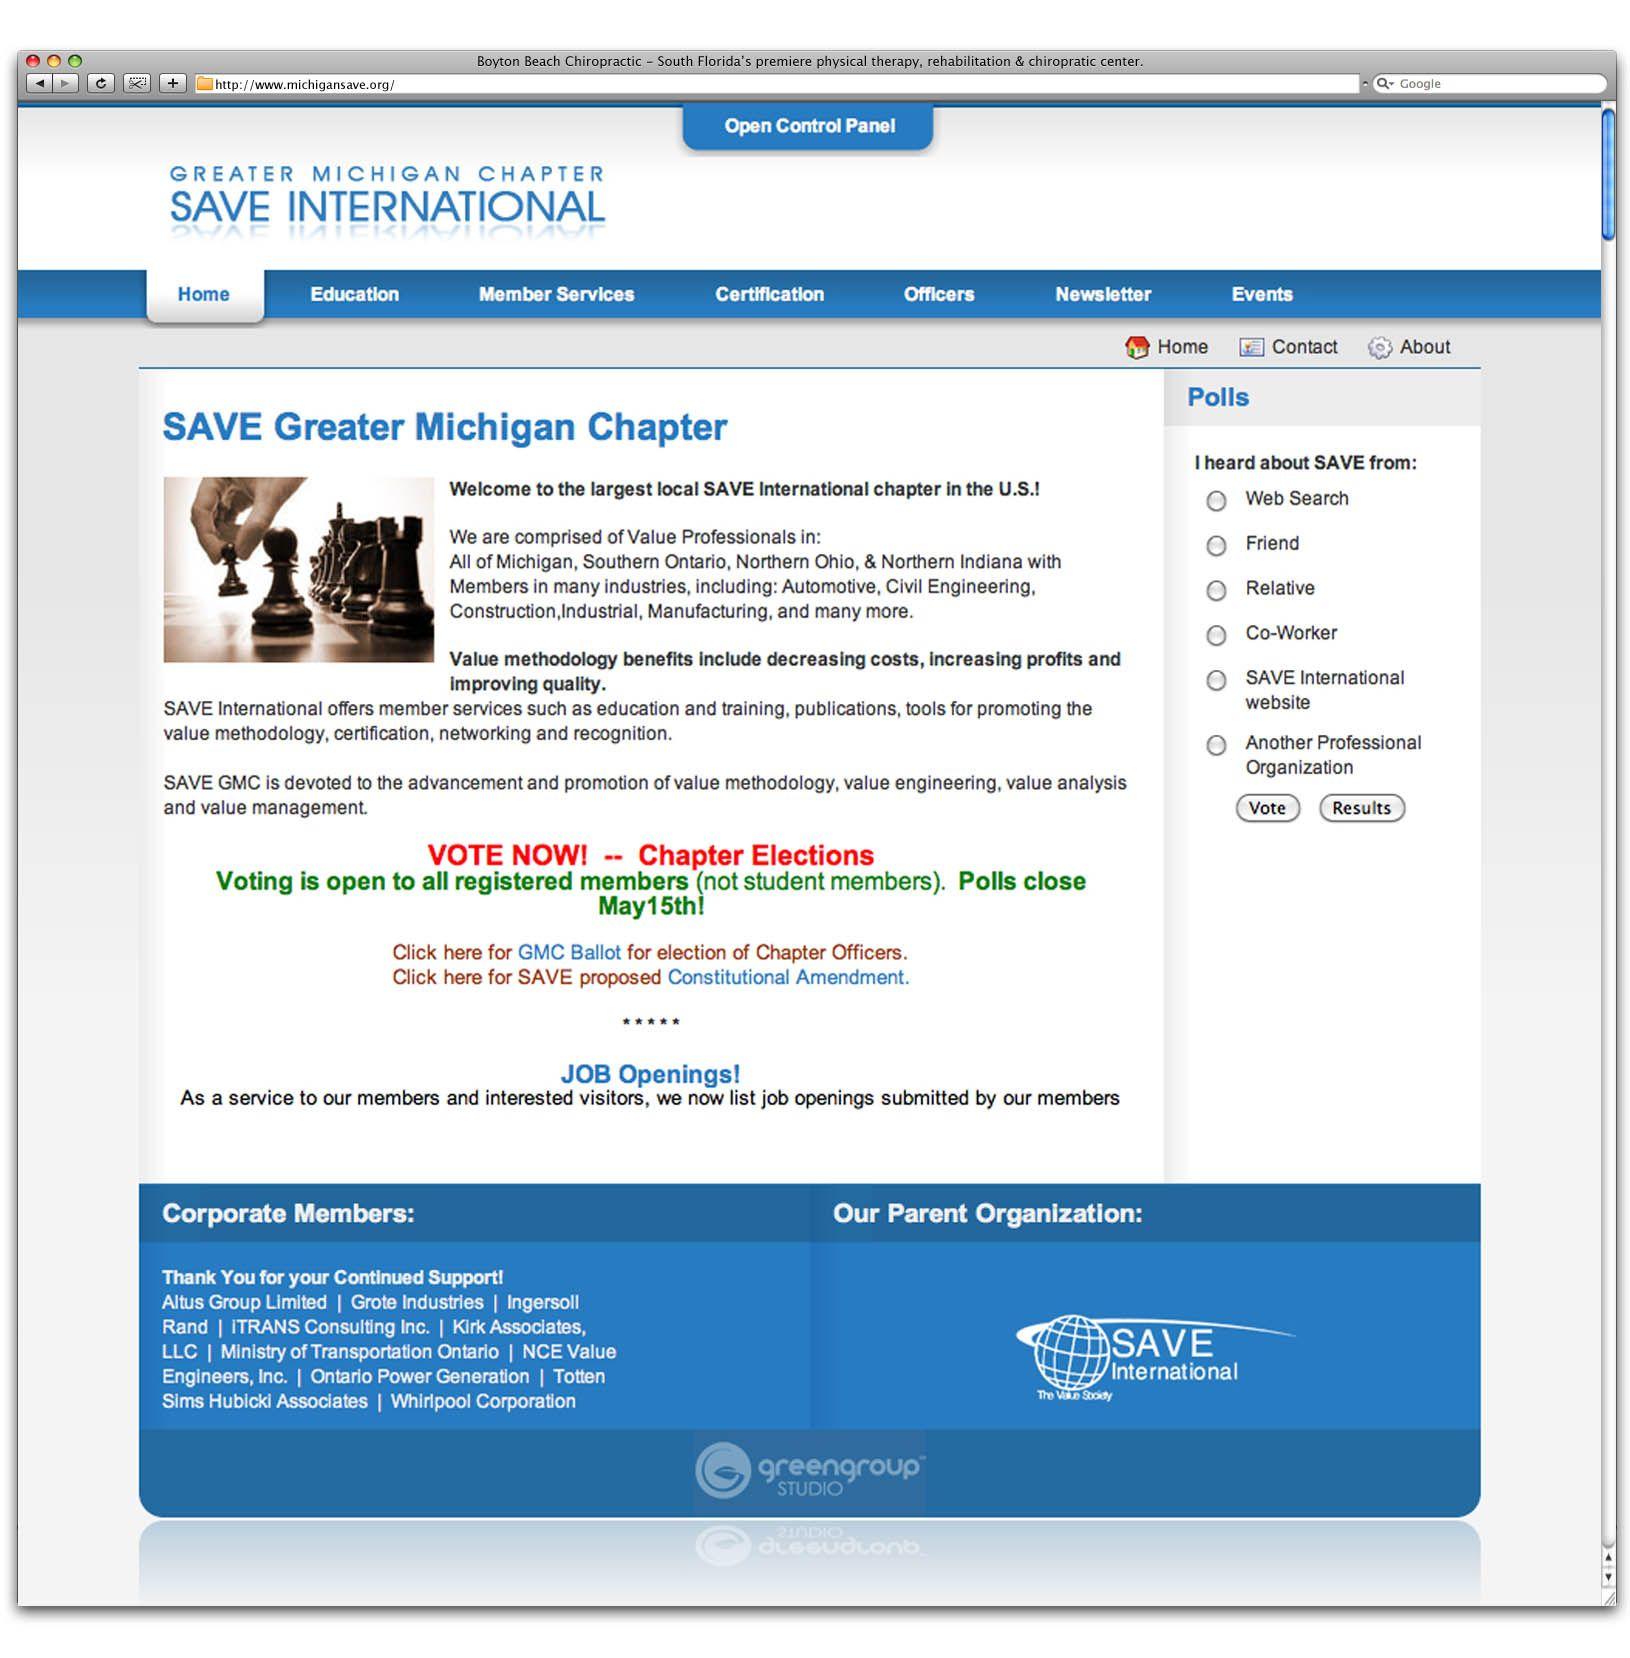 Website Design And Development For Client Save International